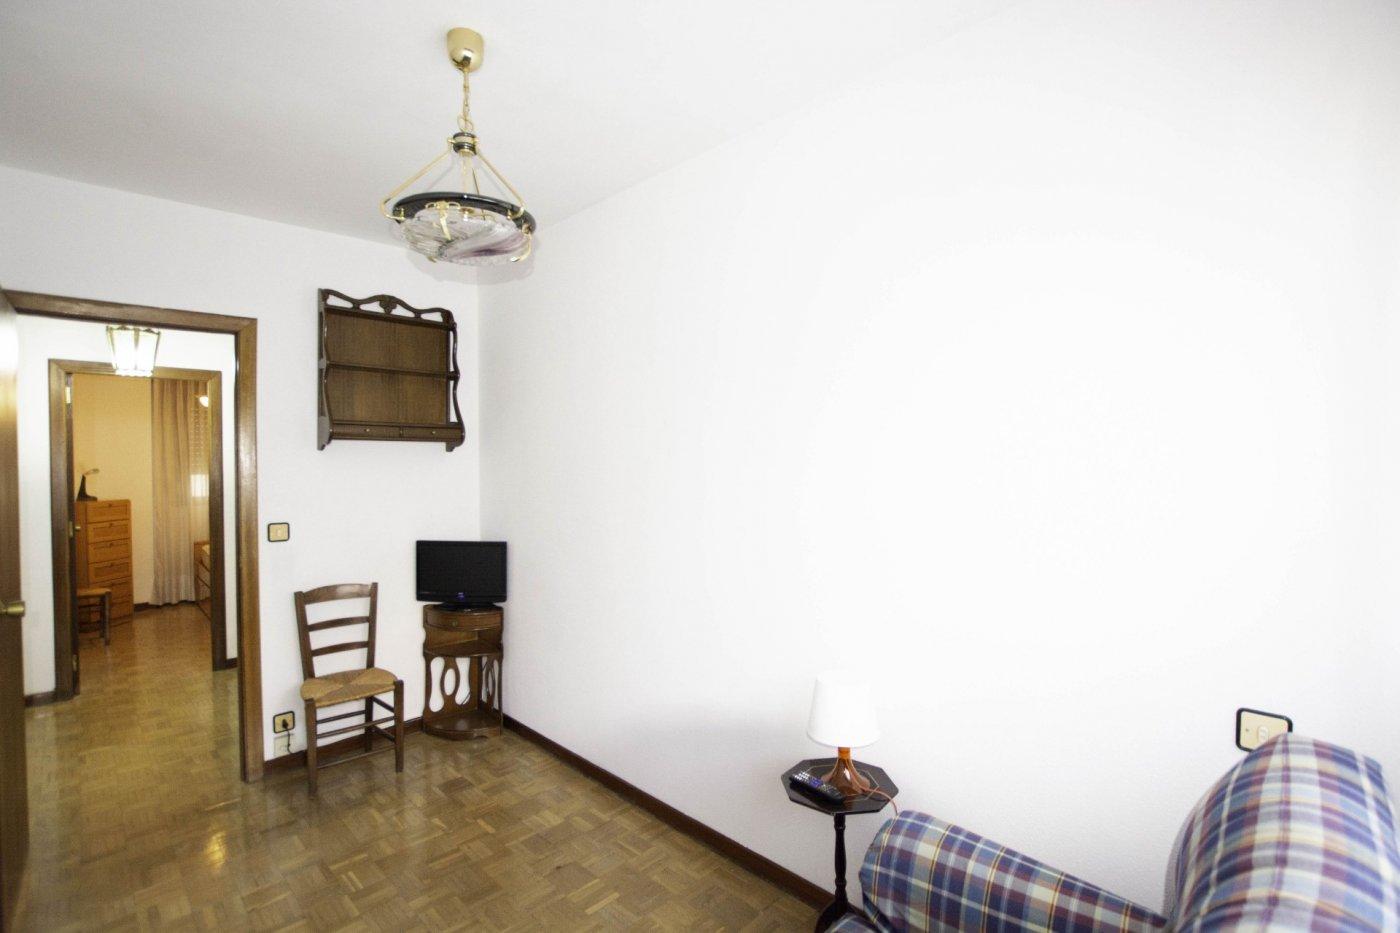 Apartamento en vallobin - imagenInmueble4